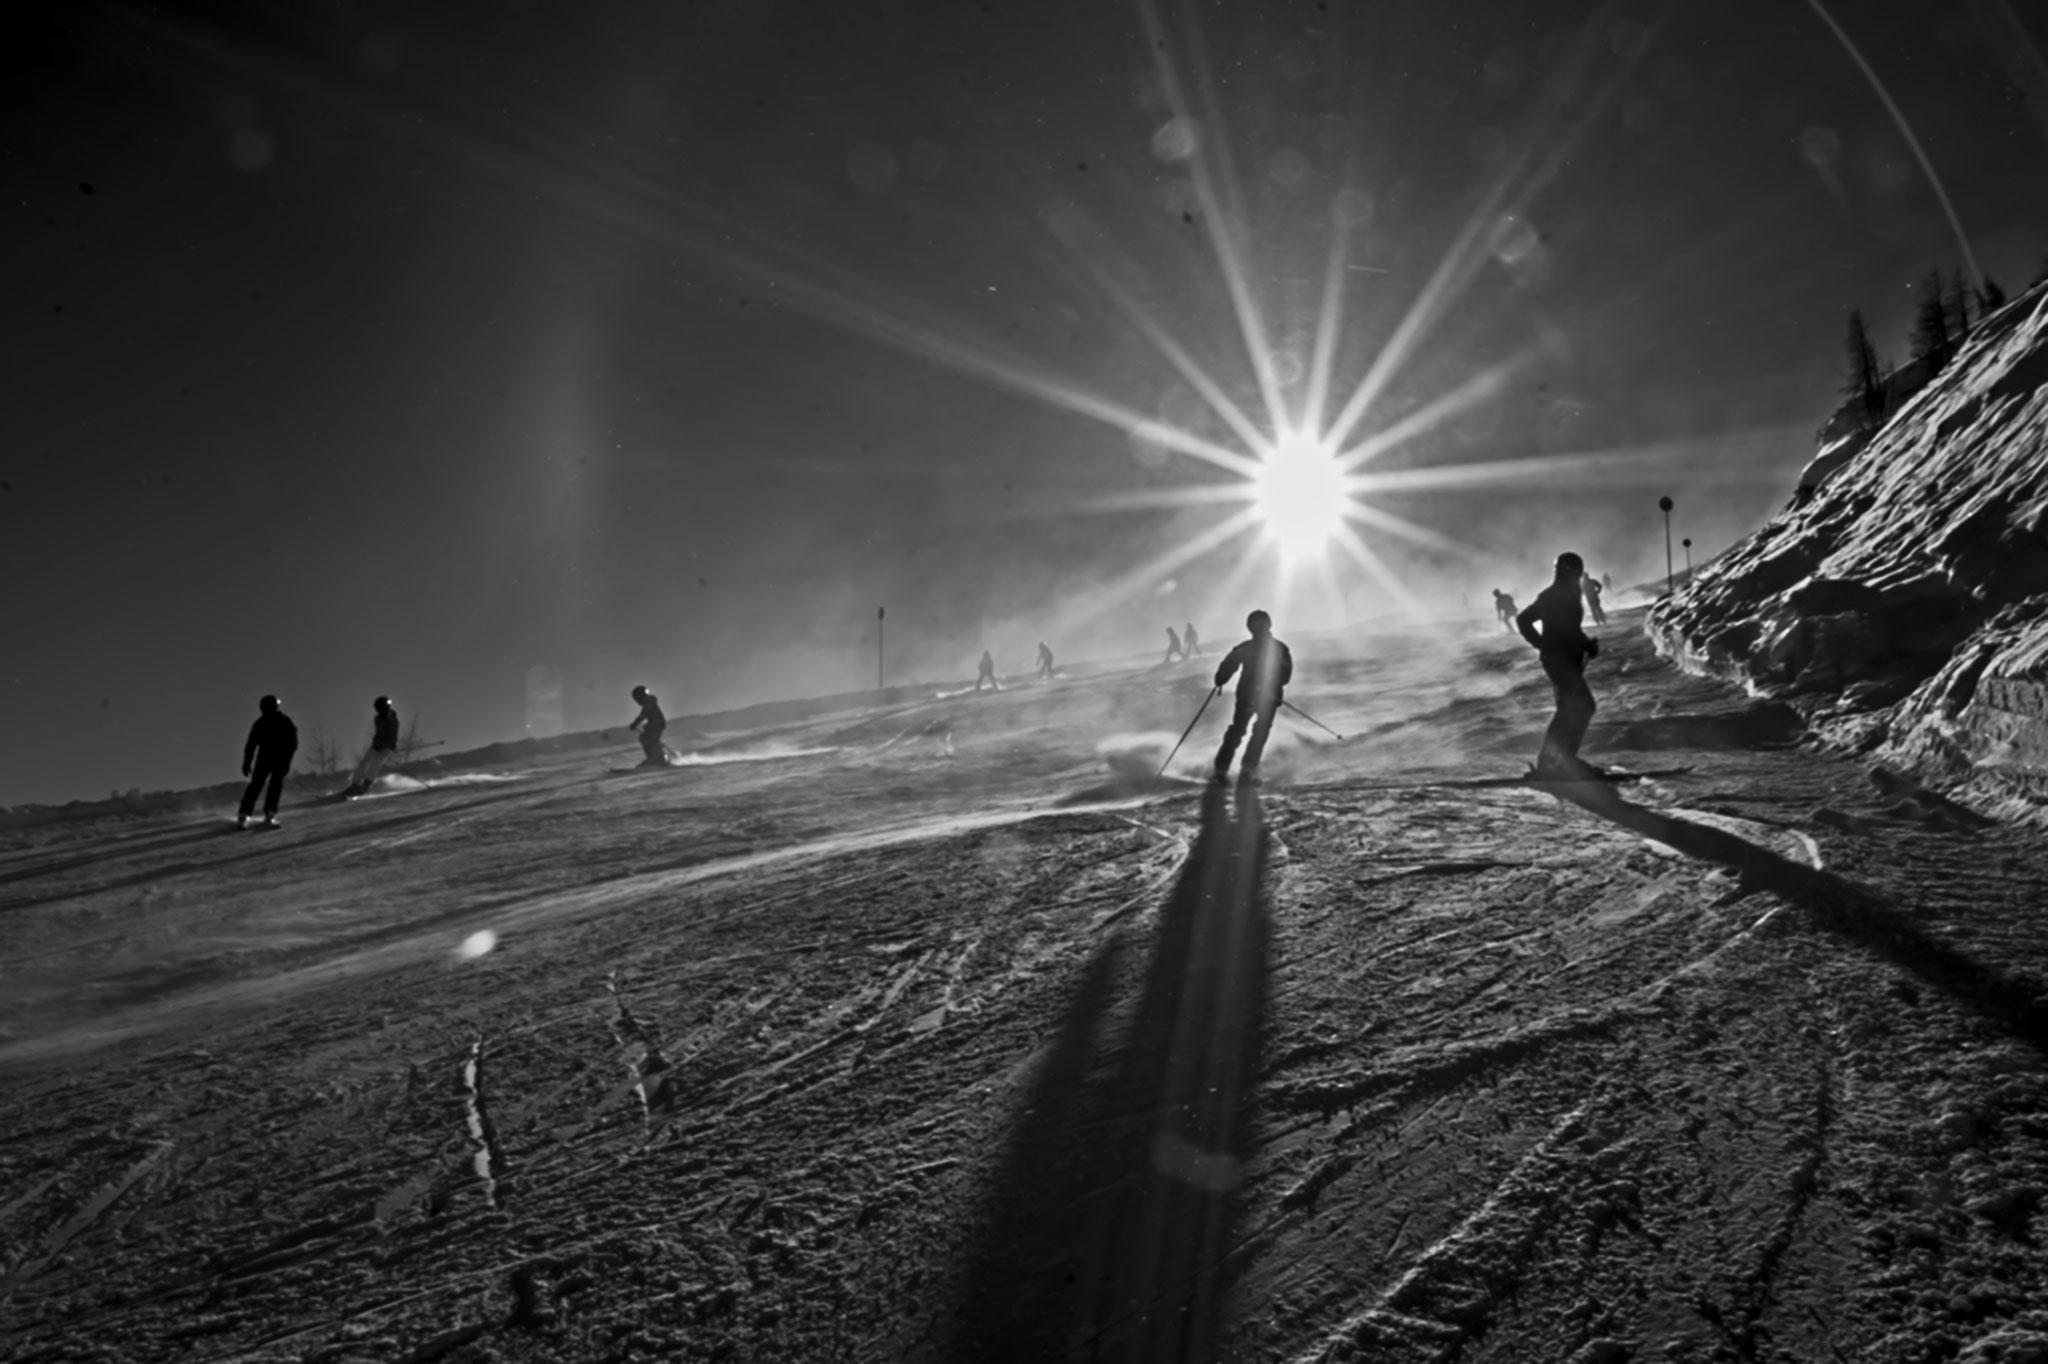 Morvay-Szabó Edina (Romania) -  In the sun